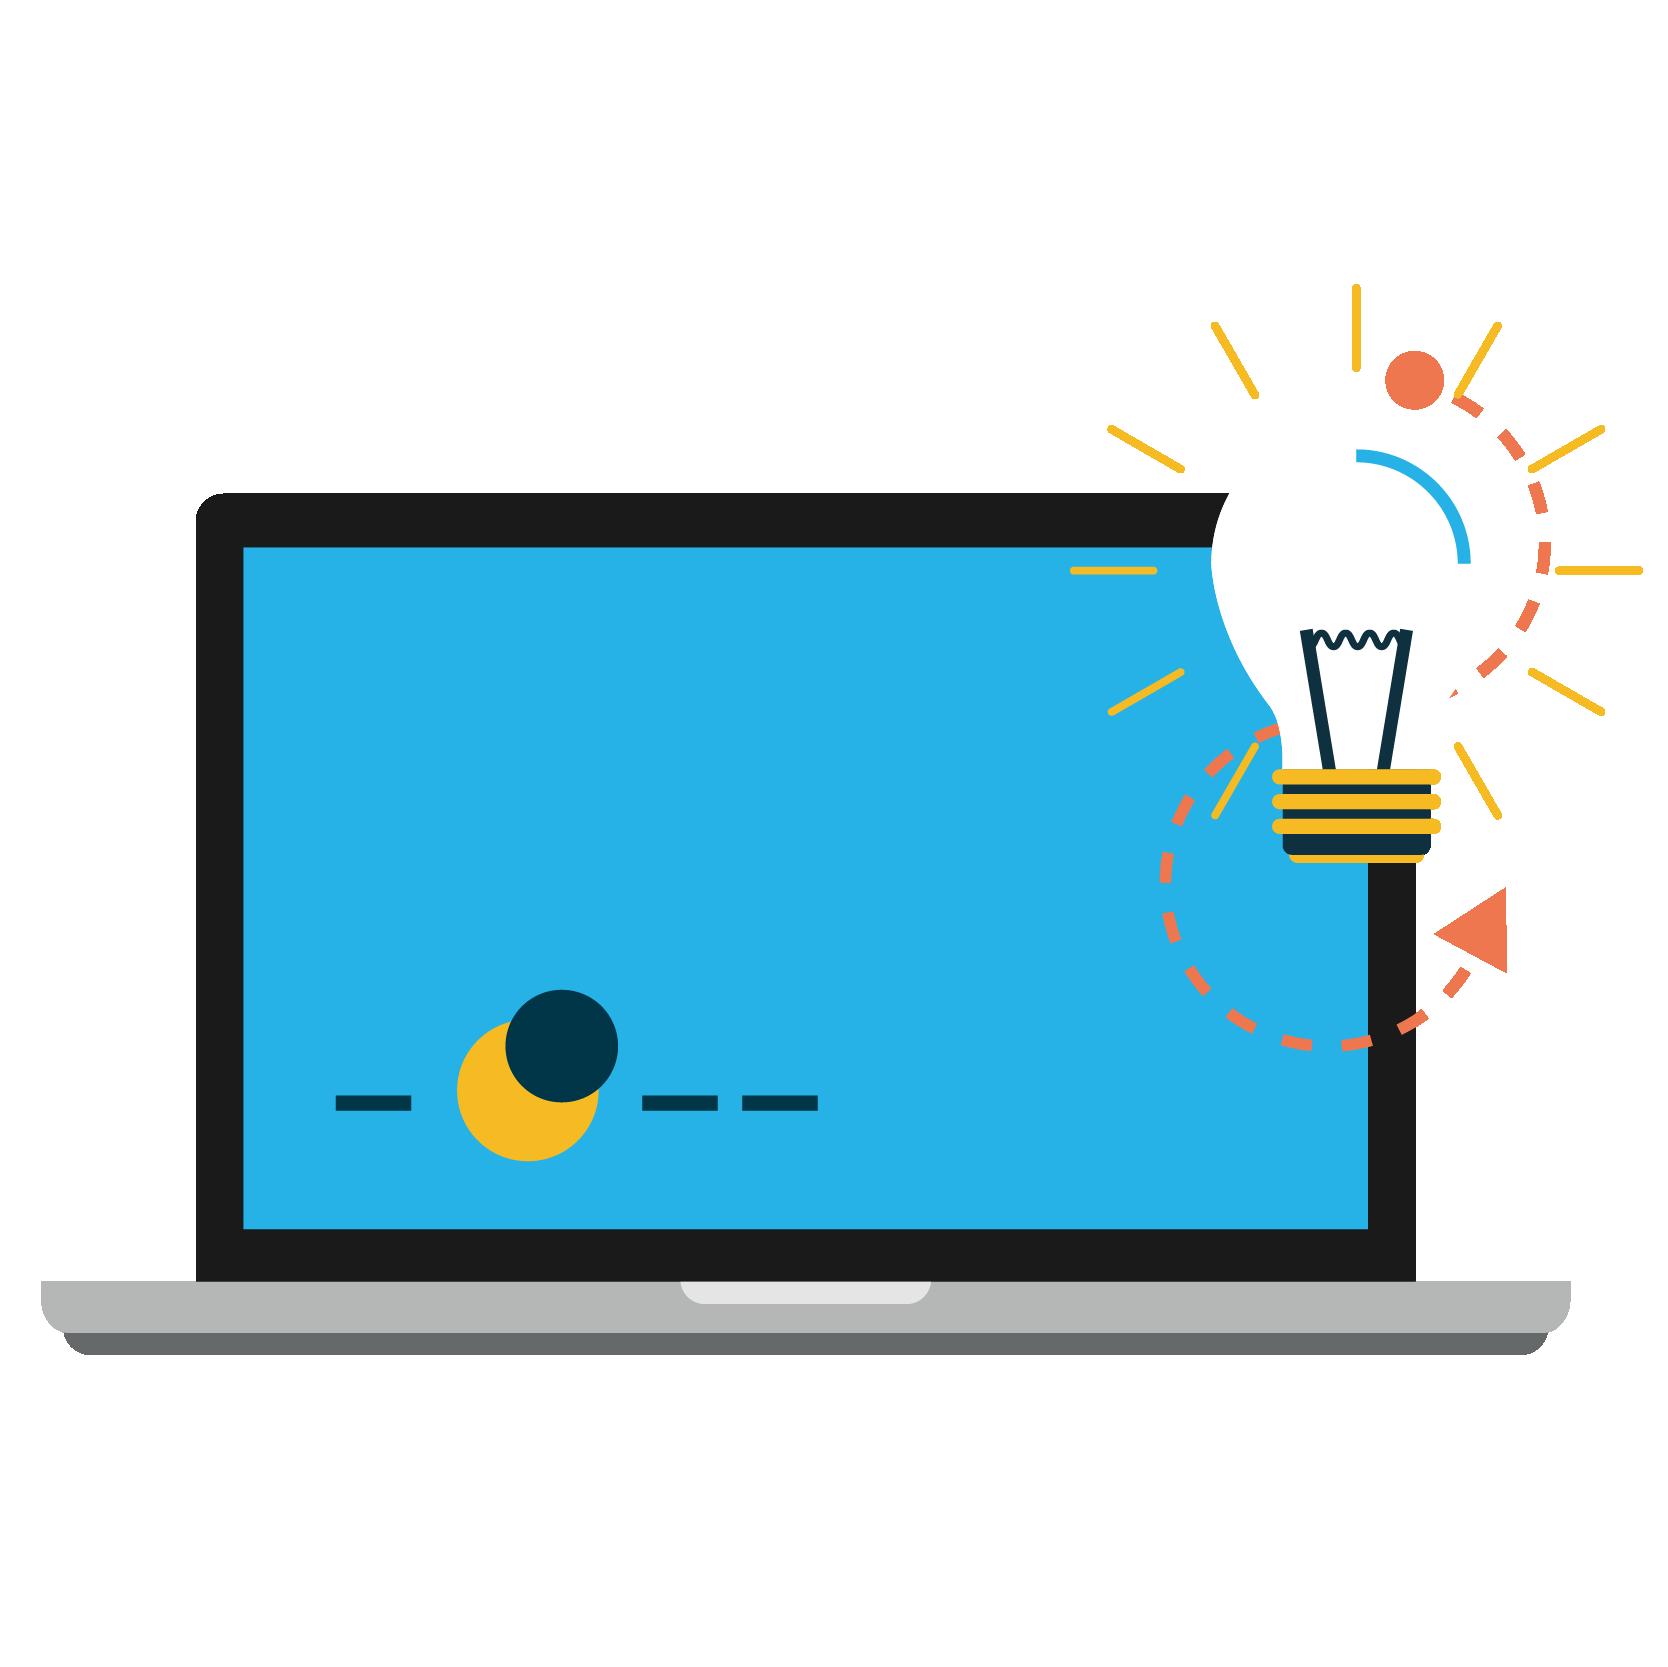 gazzaroo webdesign services webdevelopment branding design social media managemenet seo pretoria 01 - Professional Website Design and Development